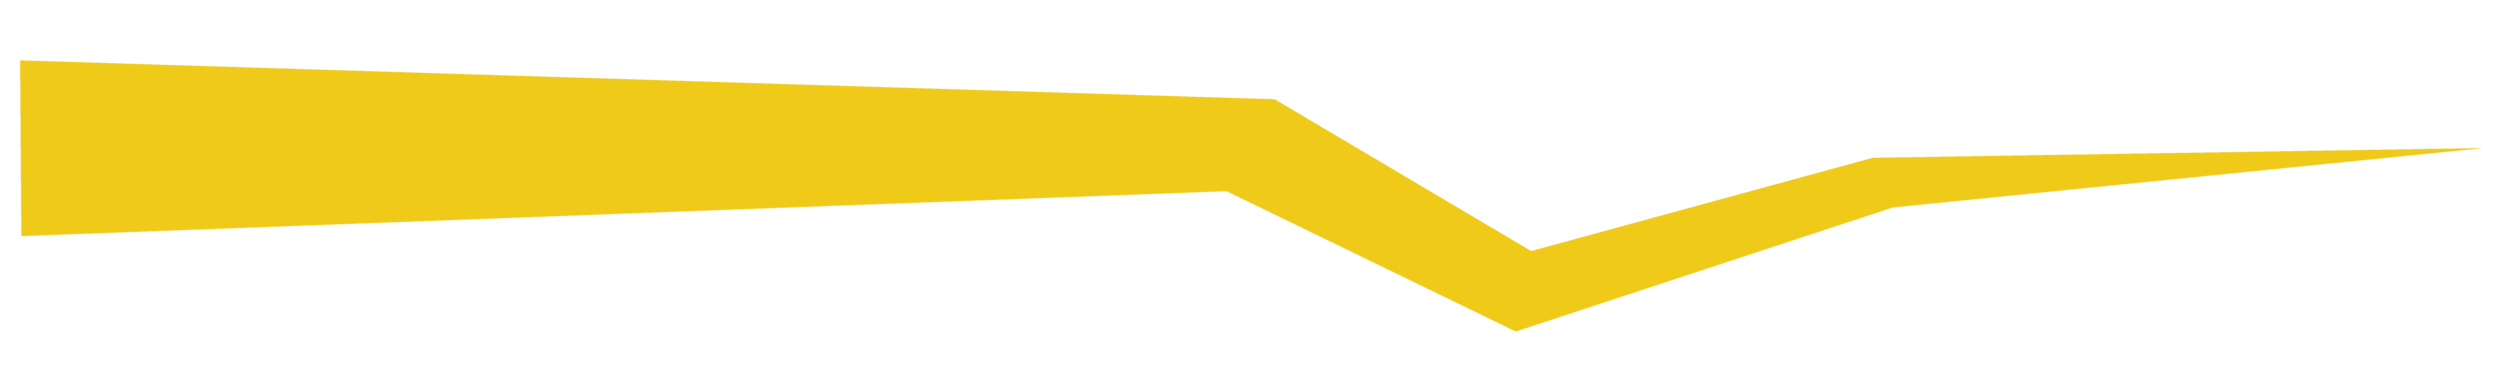 BOLT CROP yellow-01.png